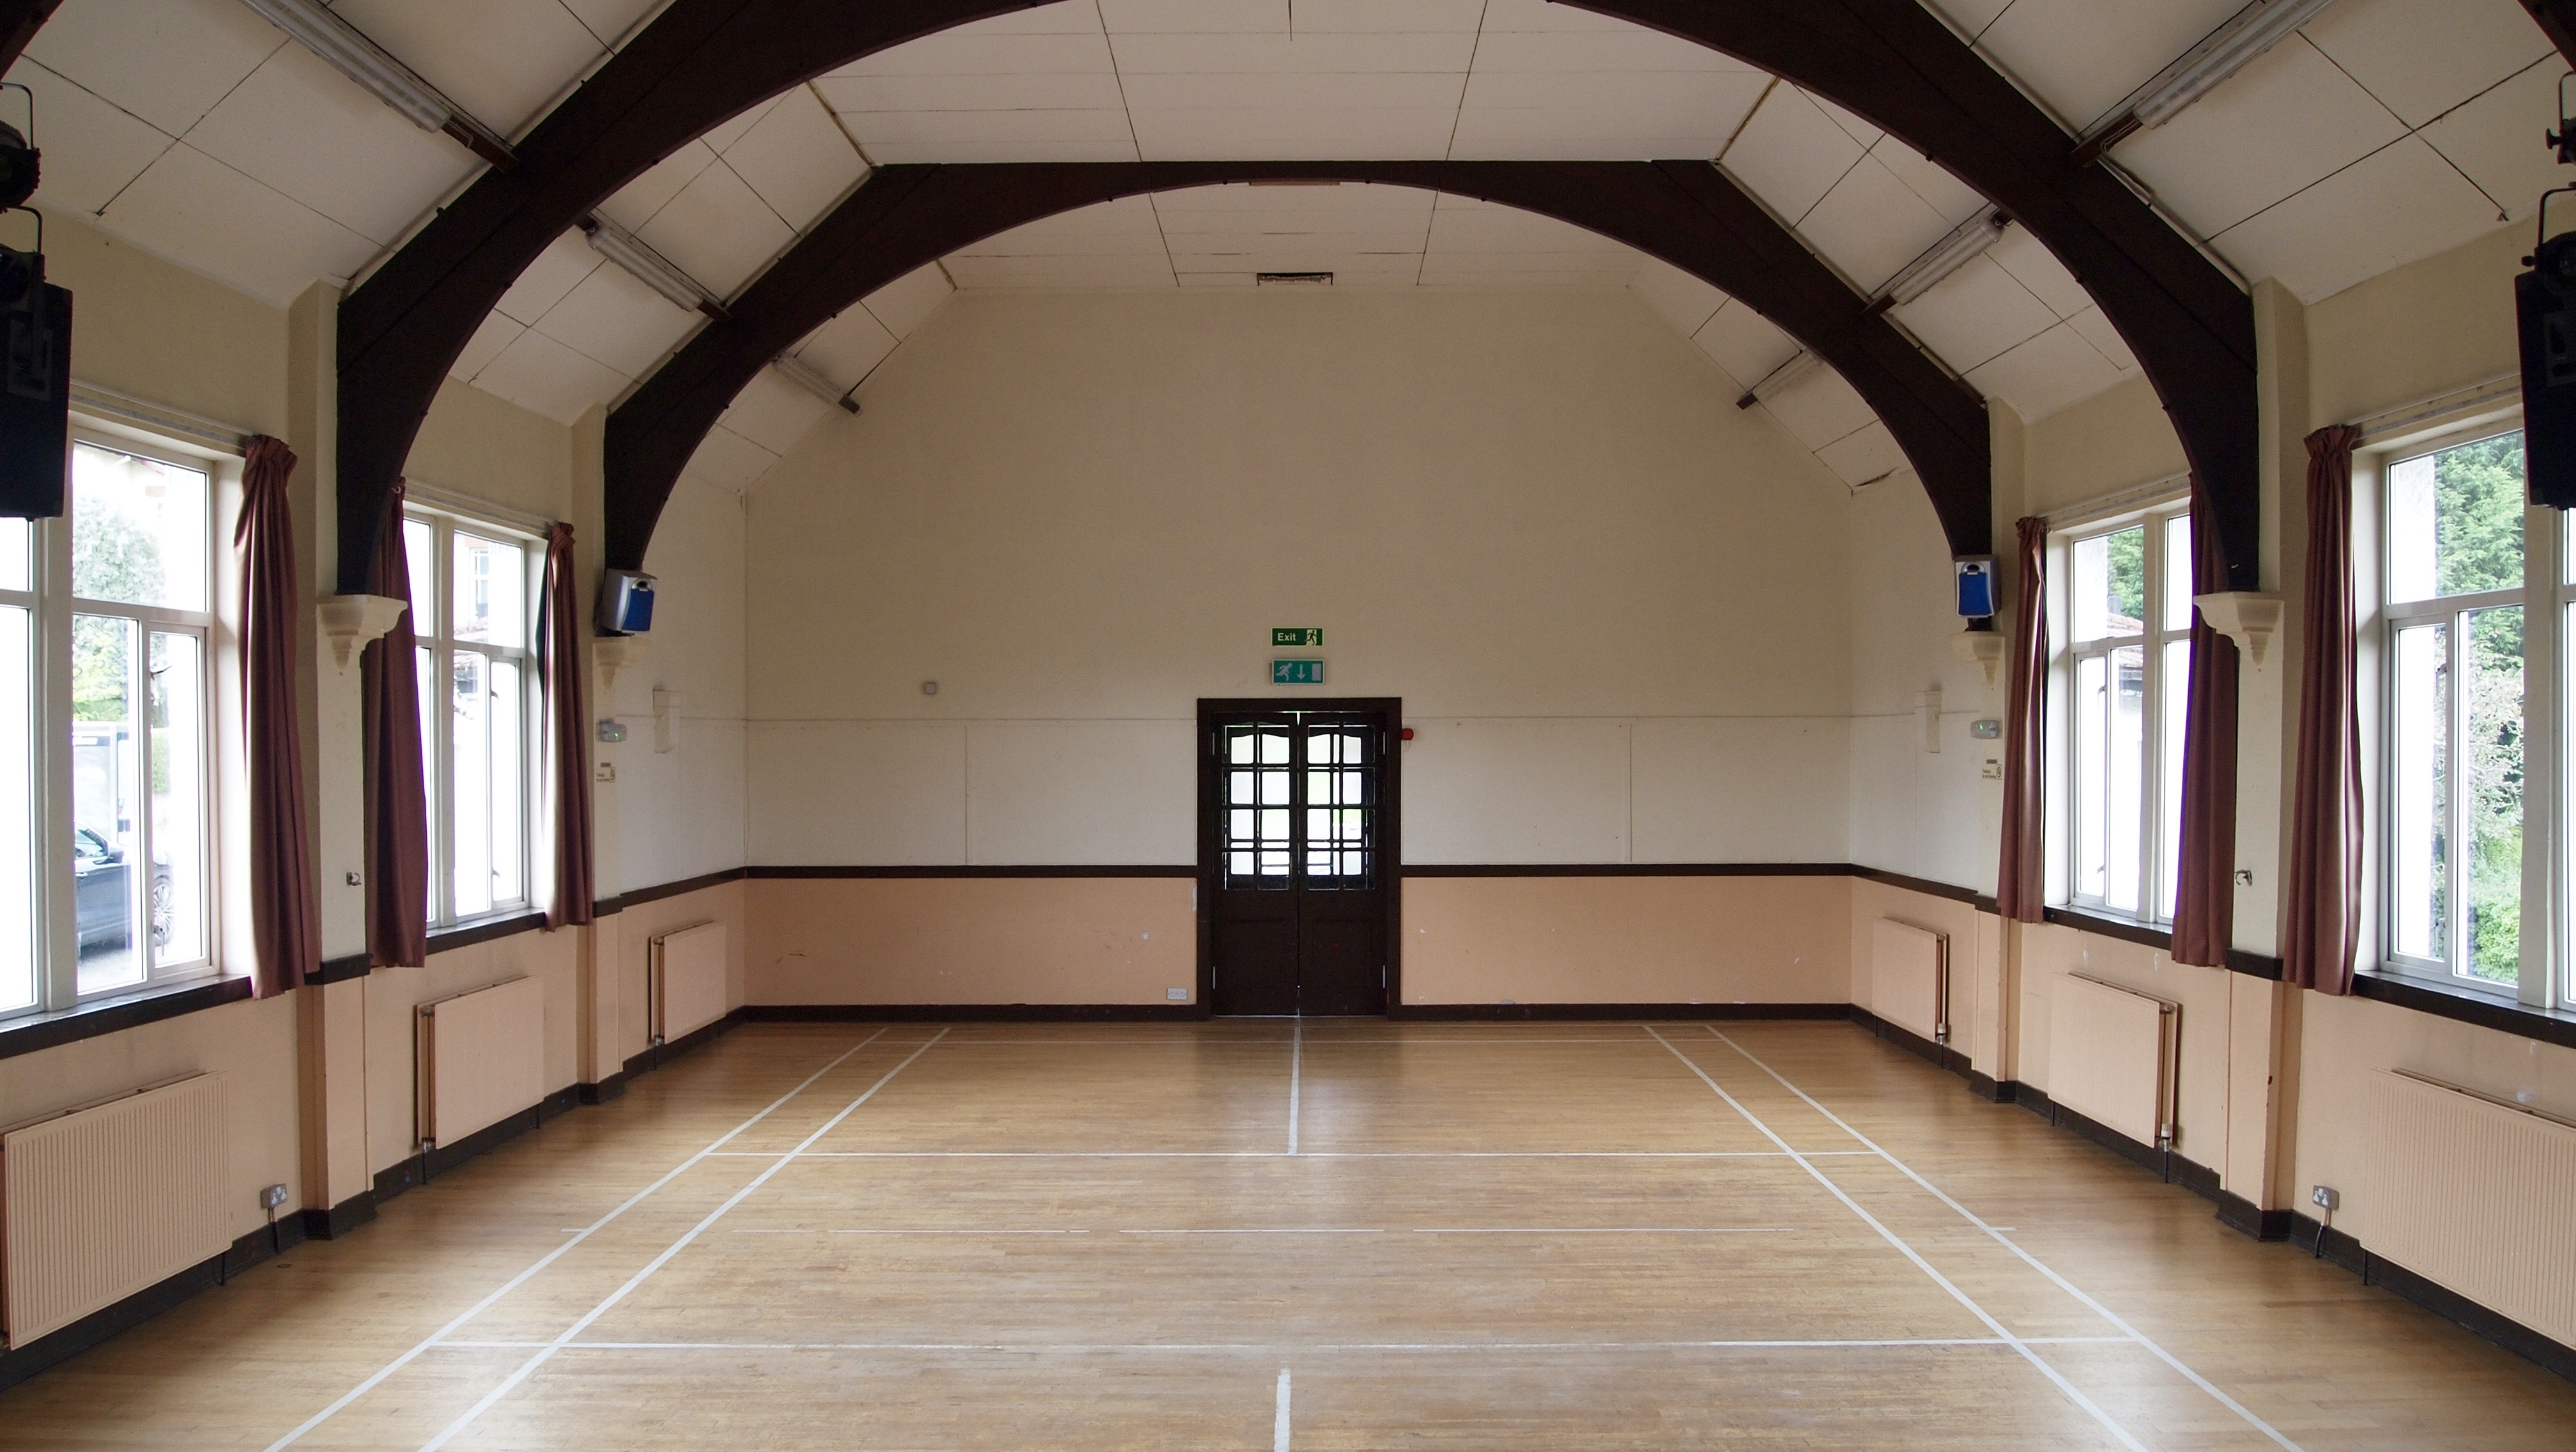 Main Hall towards front entrance